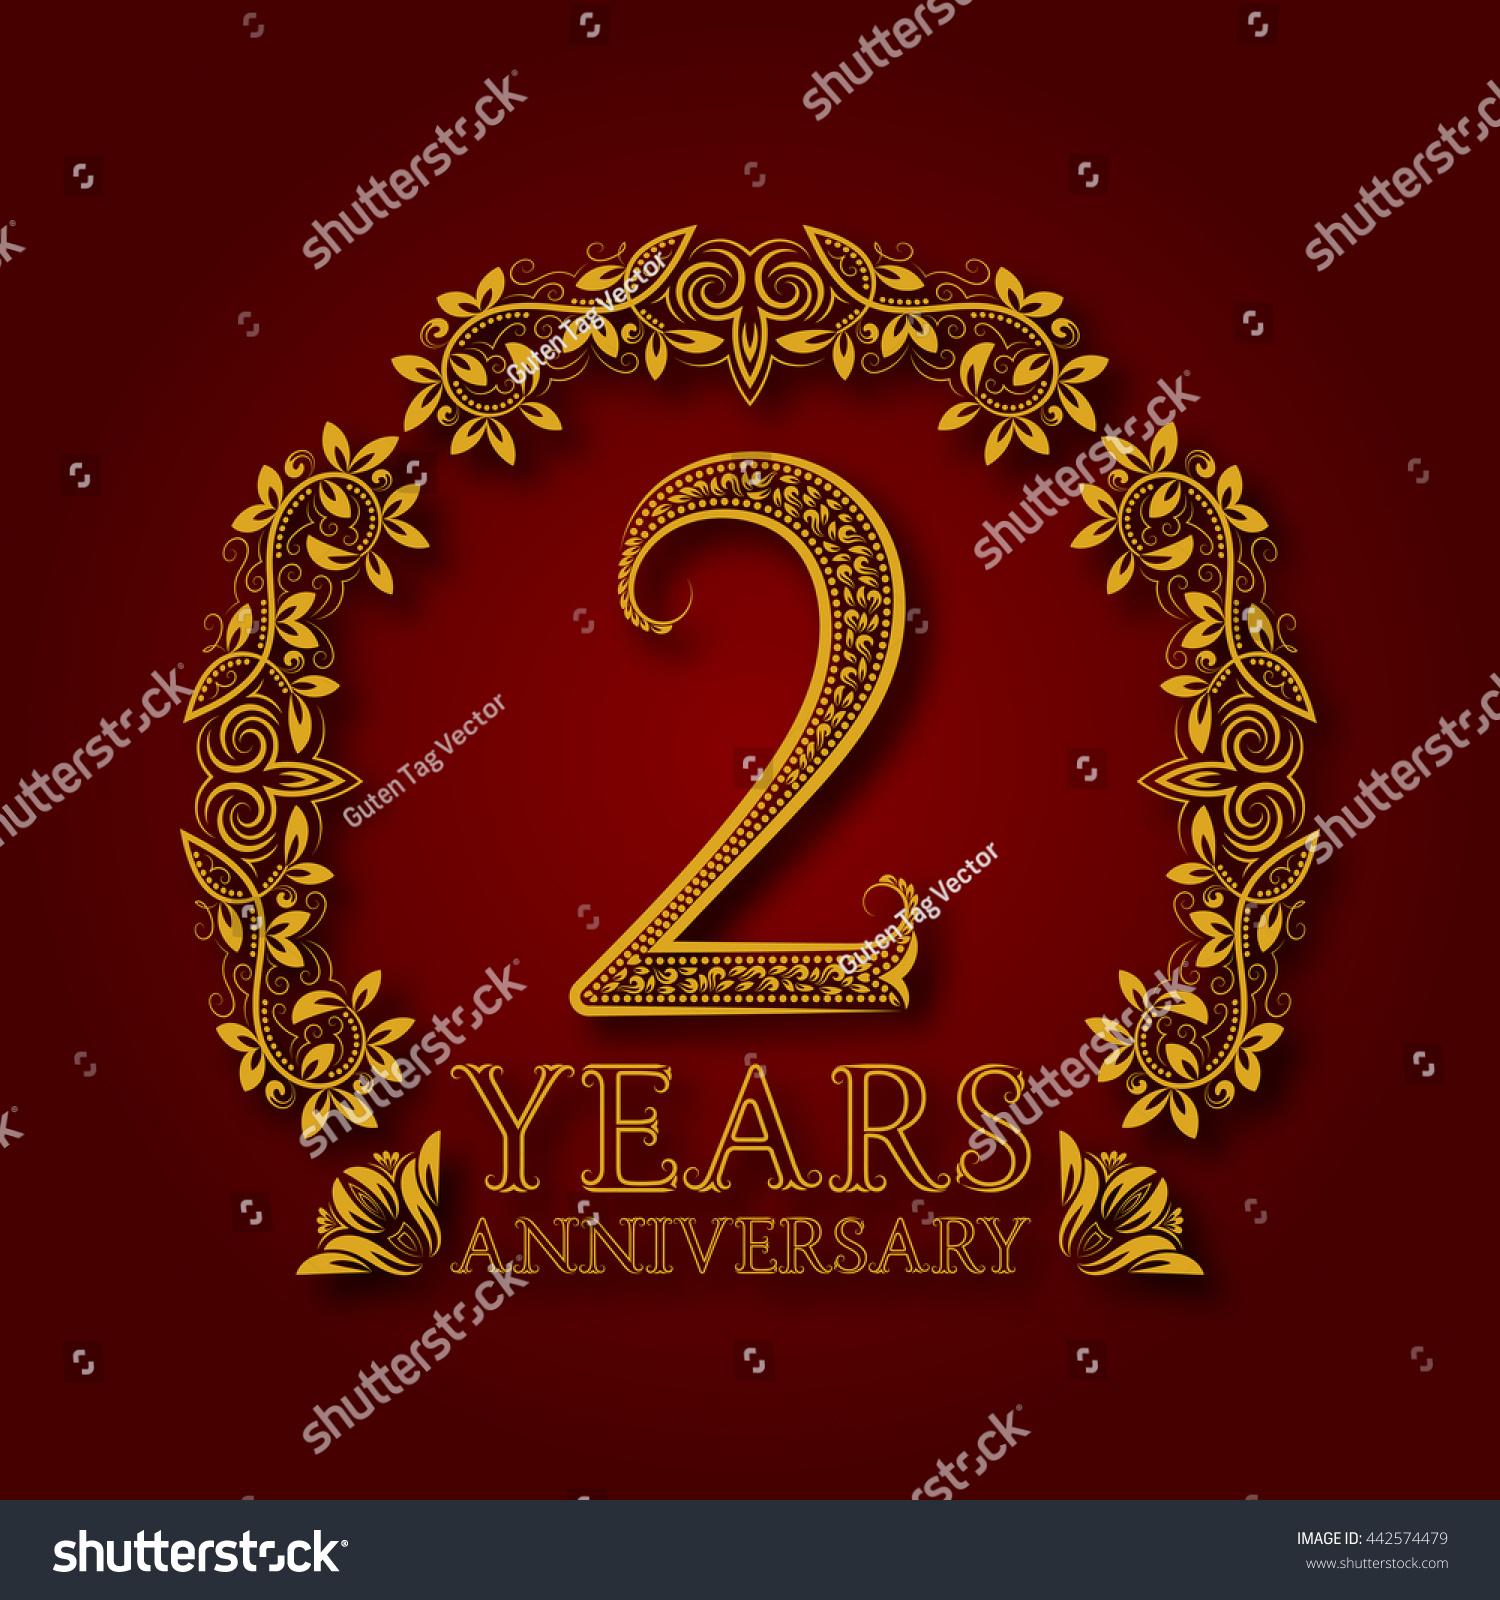 Golden Emblem Second Years Anniversary Celebration Stock